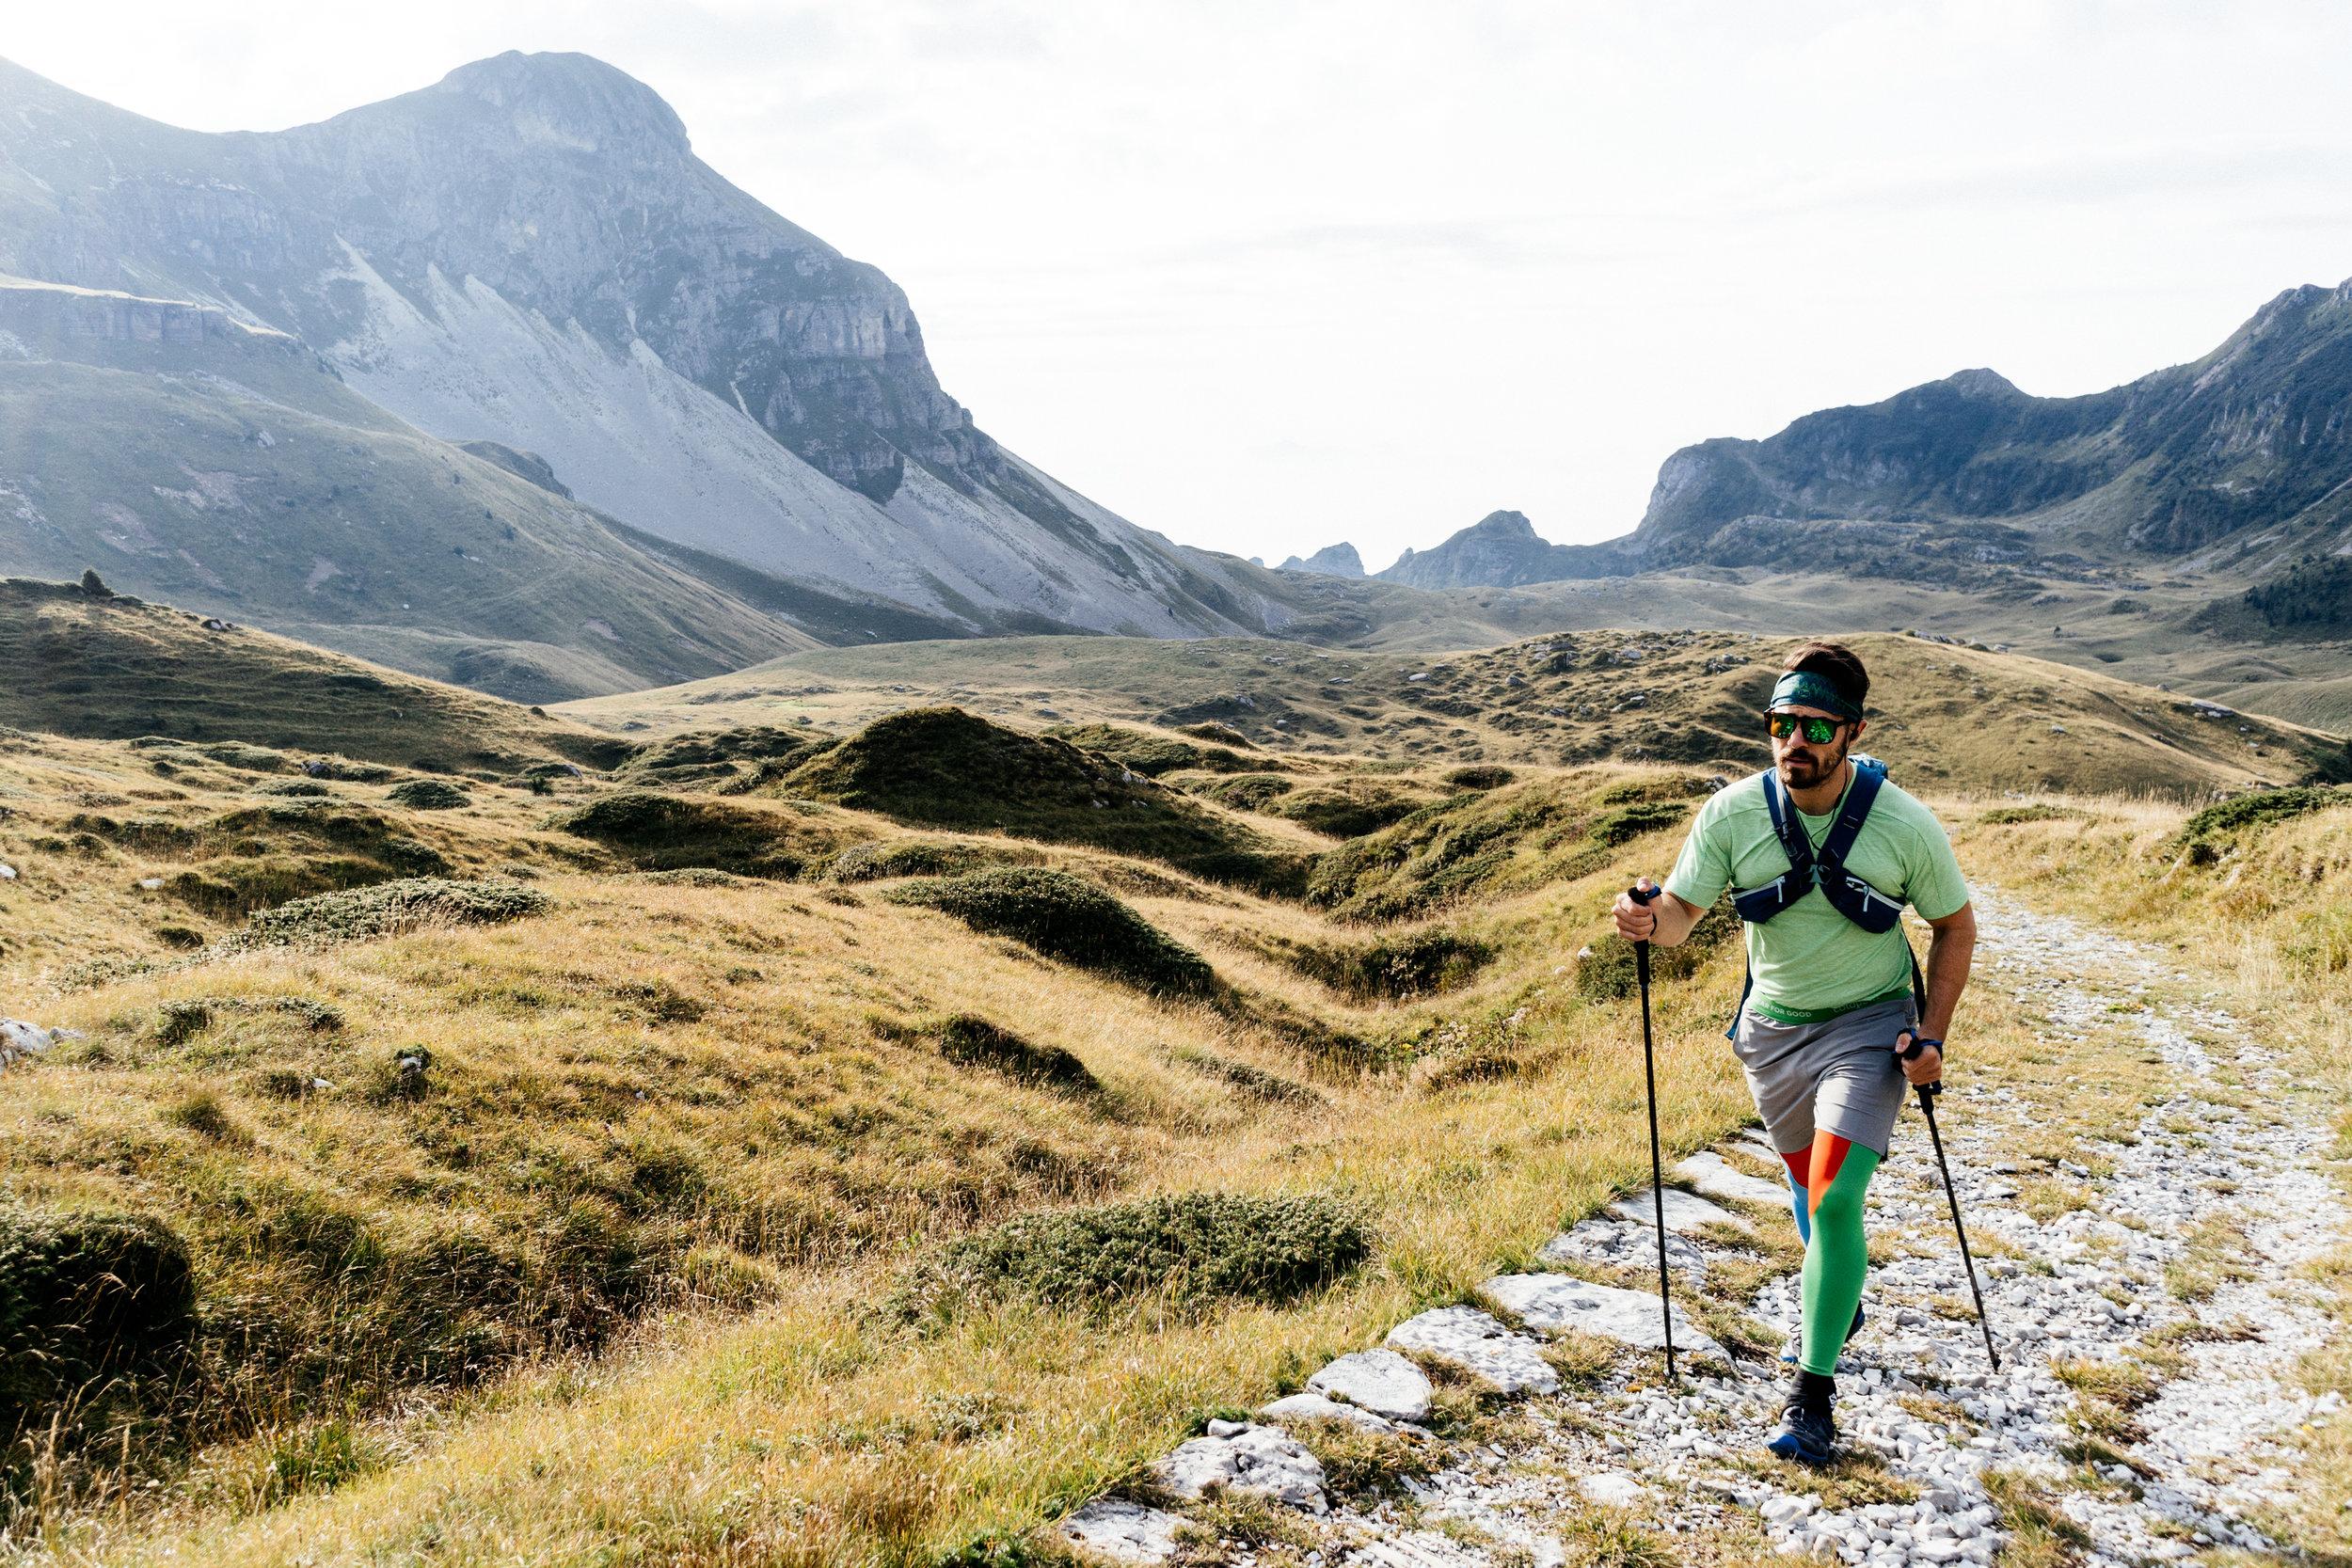 Dolomites-ChrisBrinleeJr-SEP17-4.jpg